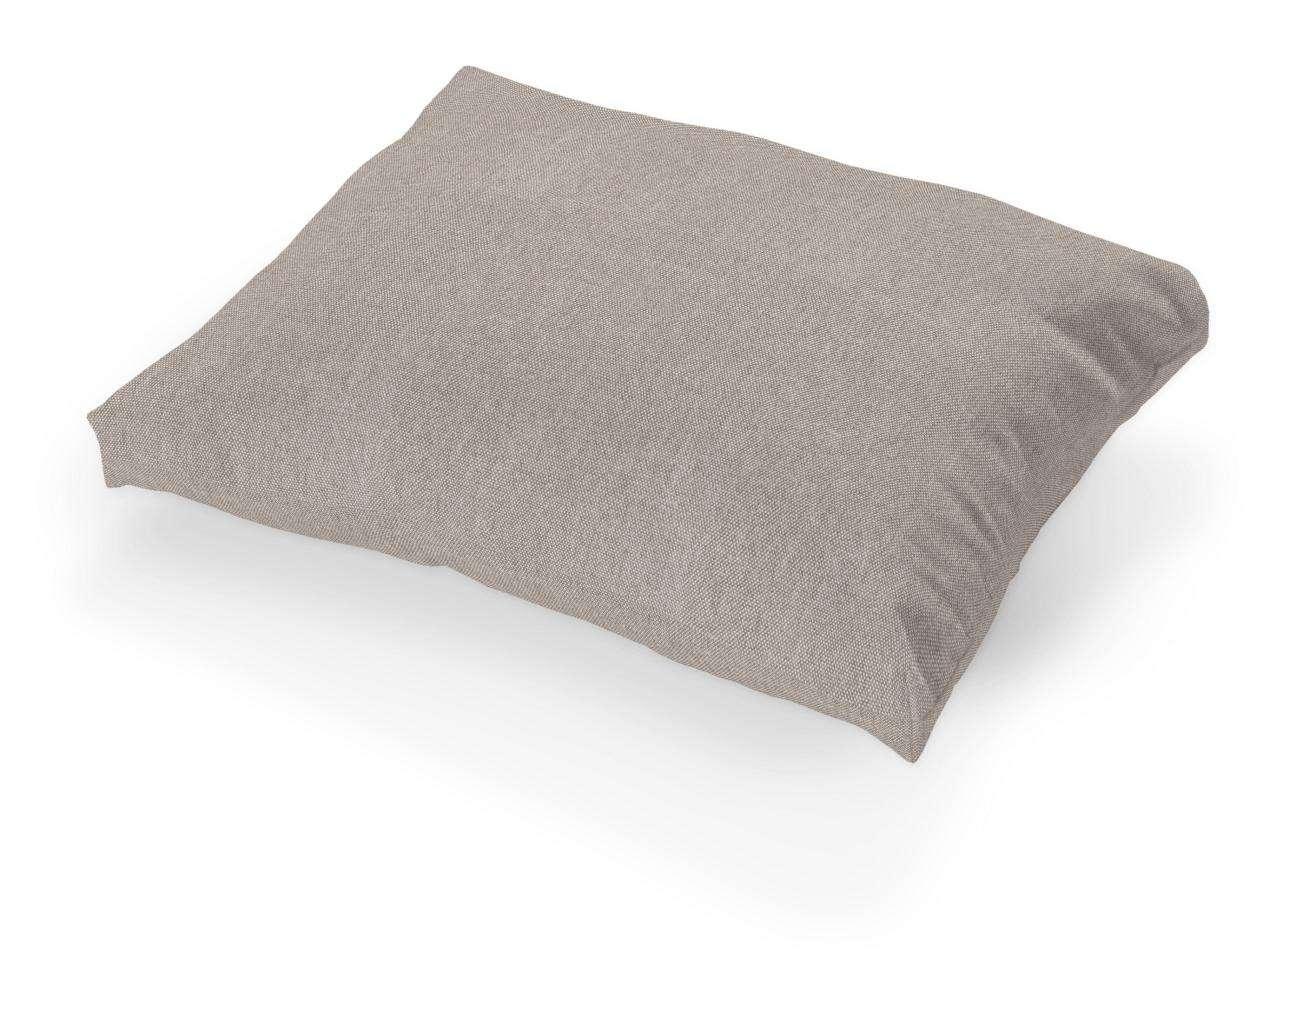 Tylösand pagalvėlės užvalkalas Tylösand pagalvėlė kolekcijoje Etna , audinys: 705-09